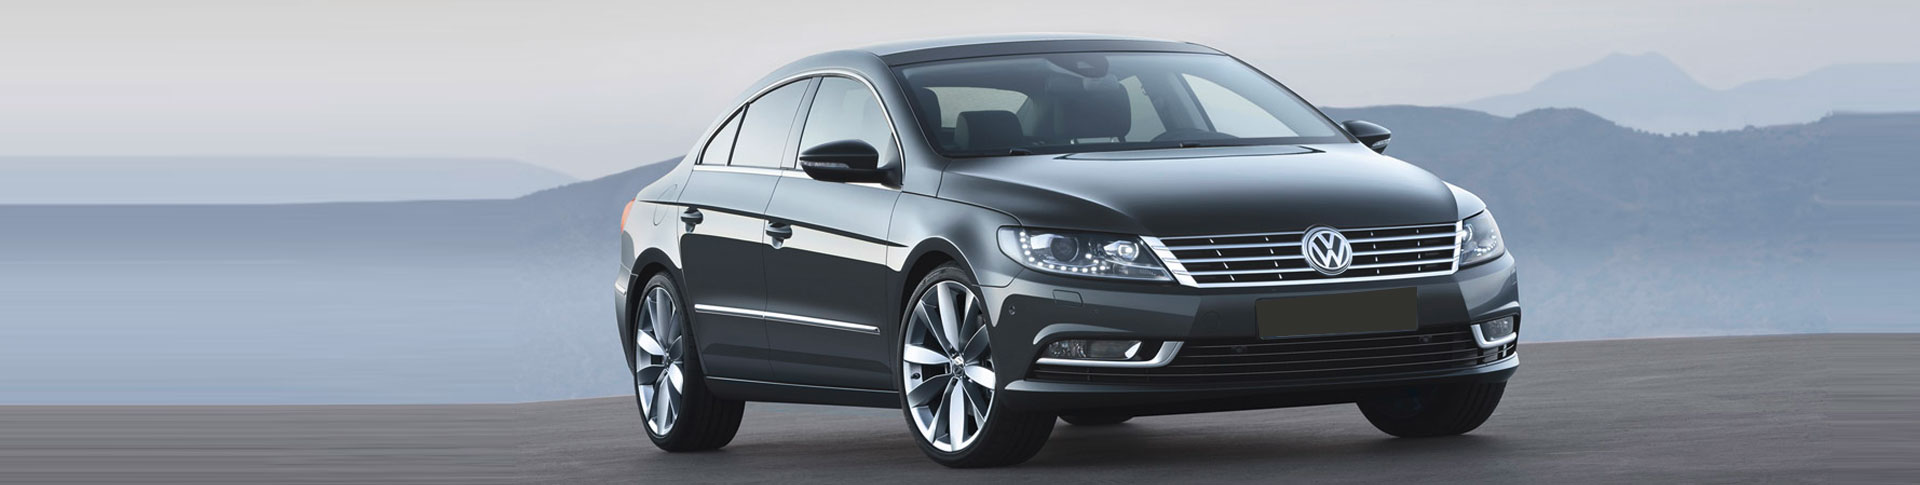 Blueprint Autos | Used Car Sales Roscommon | Car Service Roscommon ...